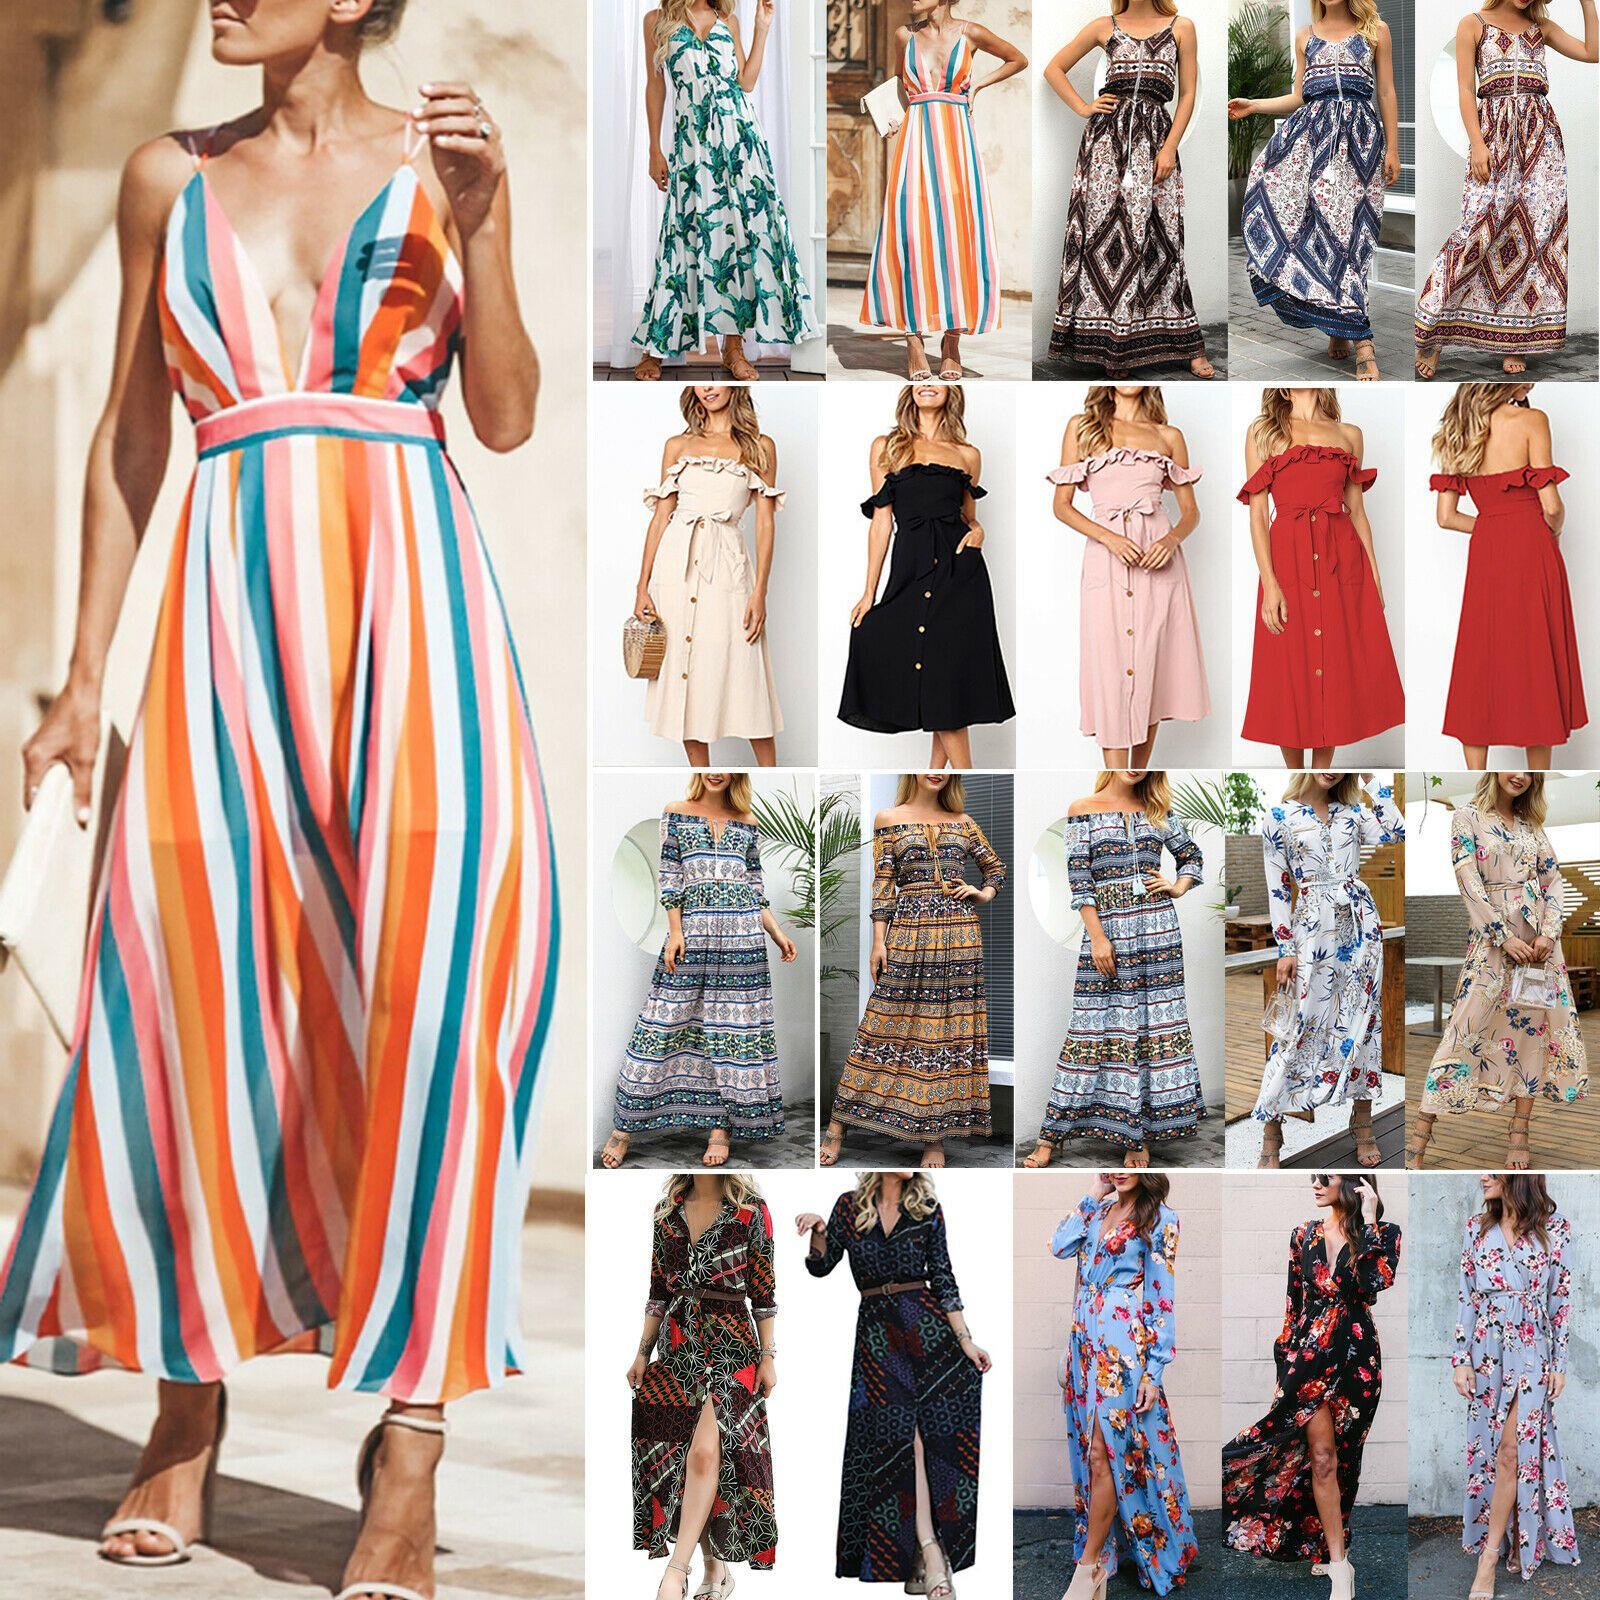 Damen Lang Kleid Sommer BOHO Maxikleid Blumen Strandkleid Party Cocktailkleider